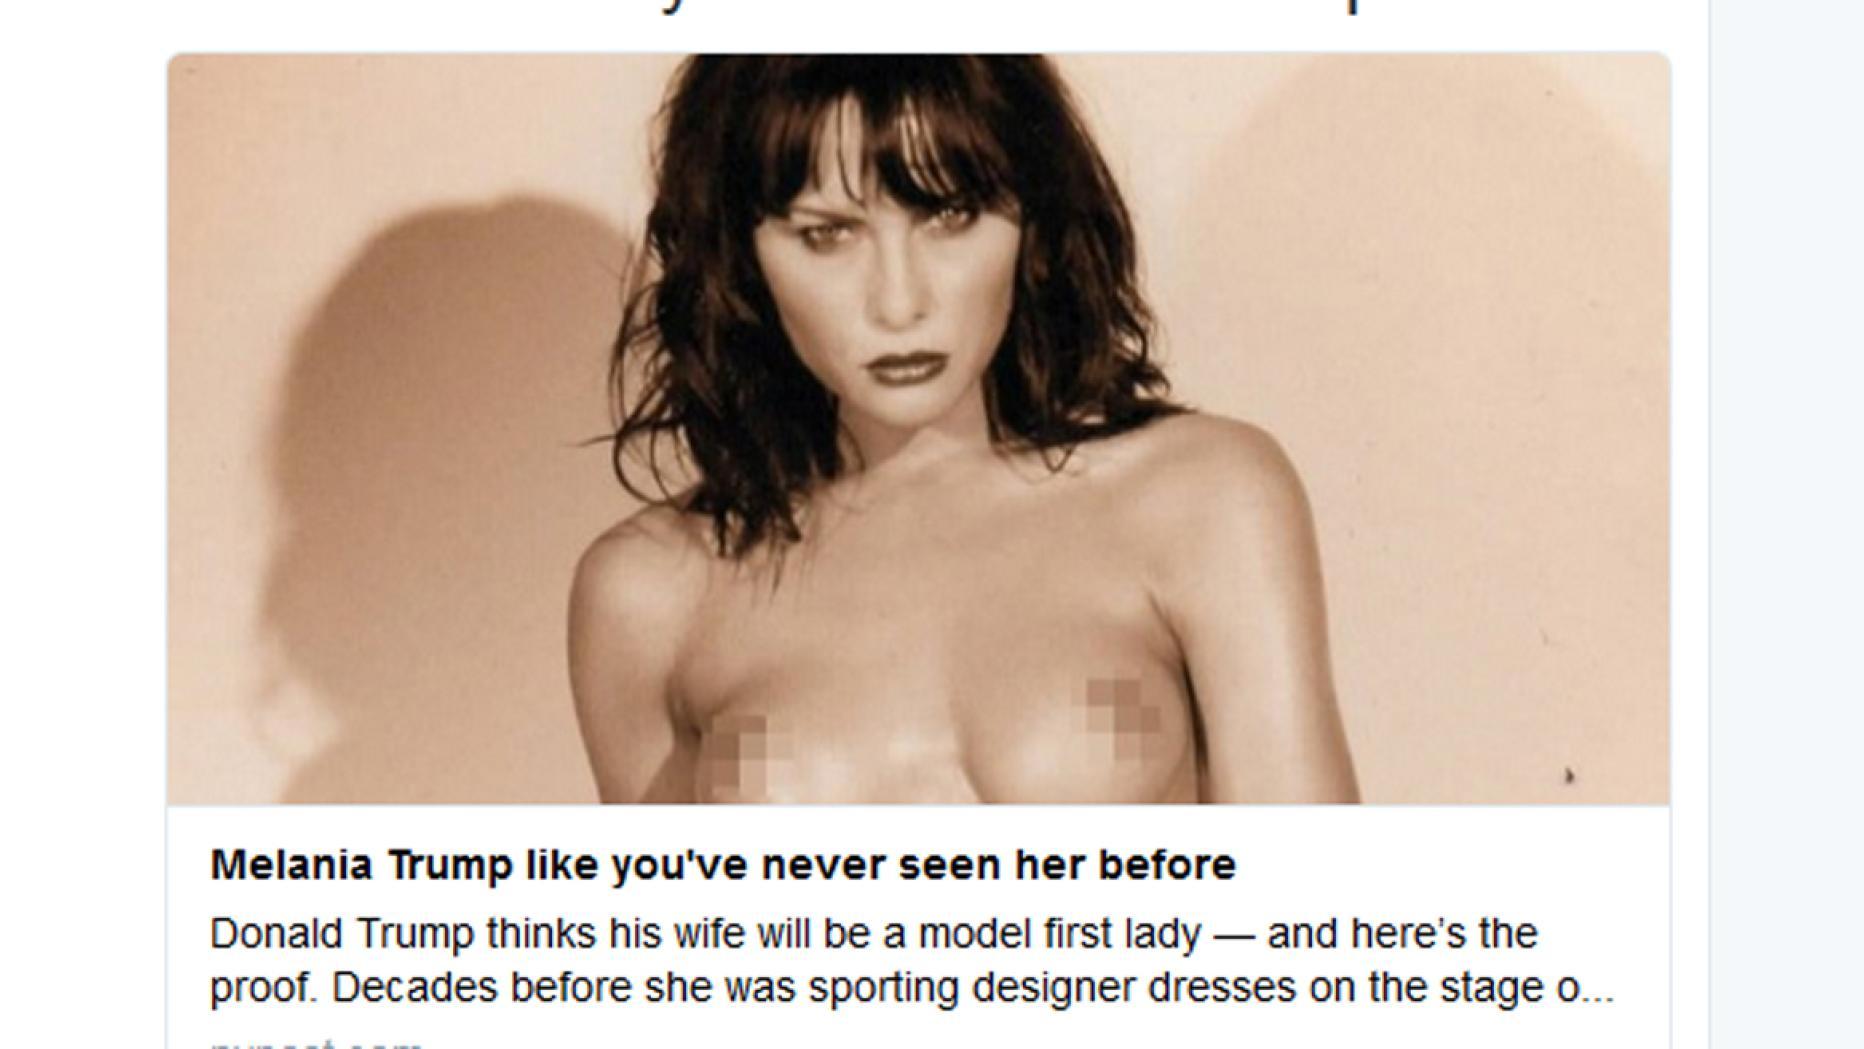 Bilder melania trump von nackt Melania Trump: